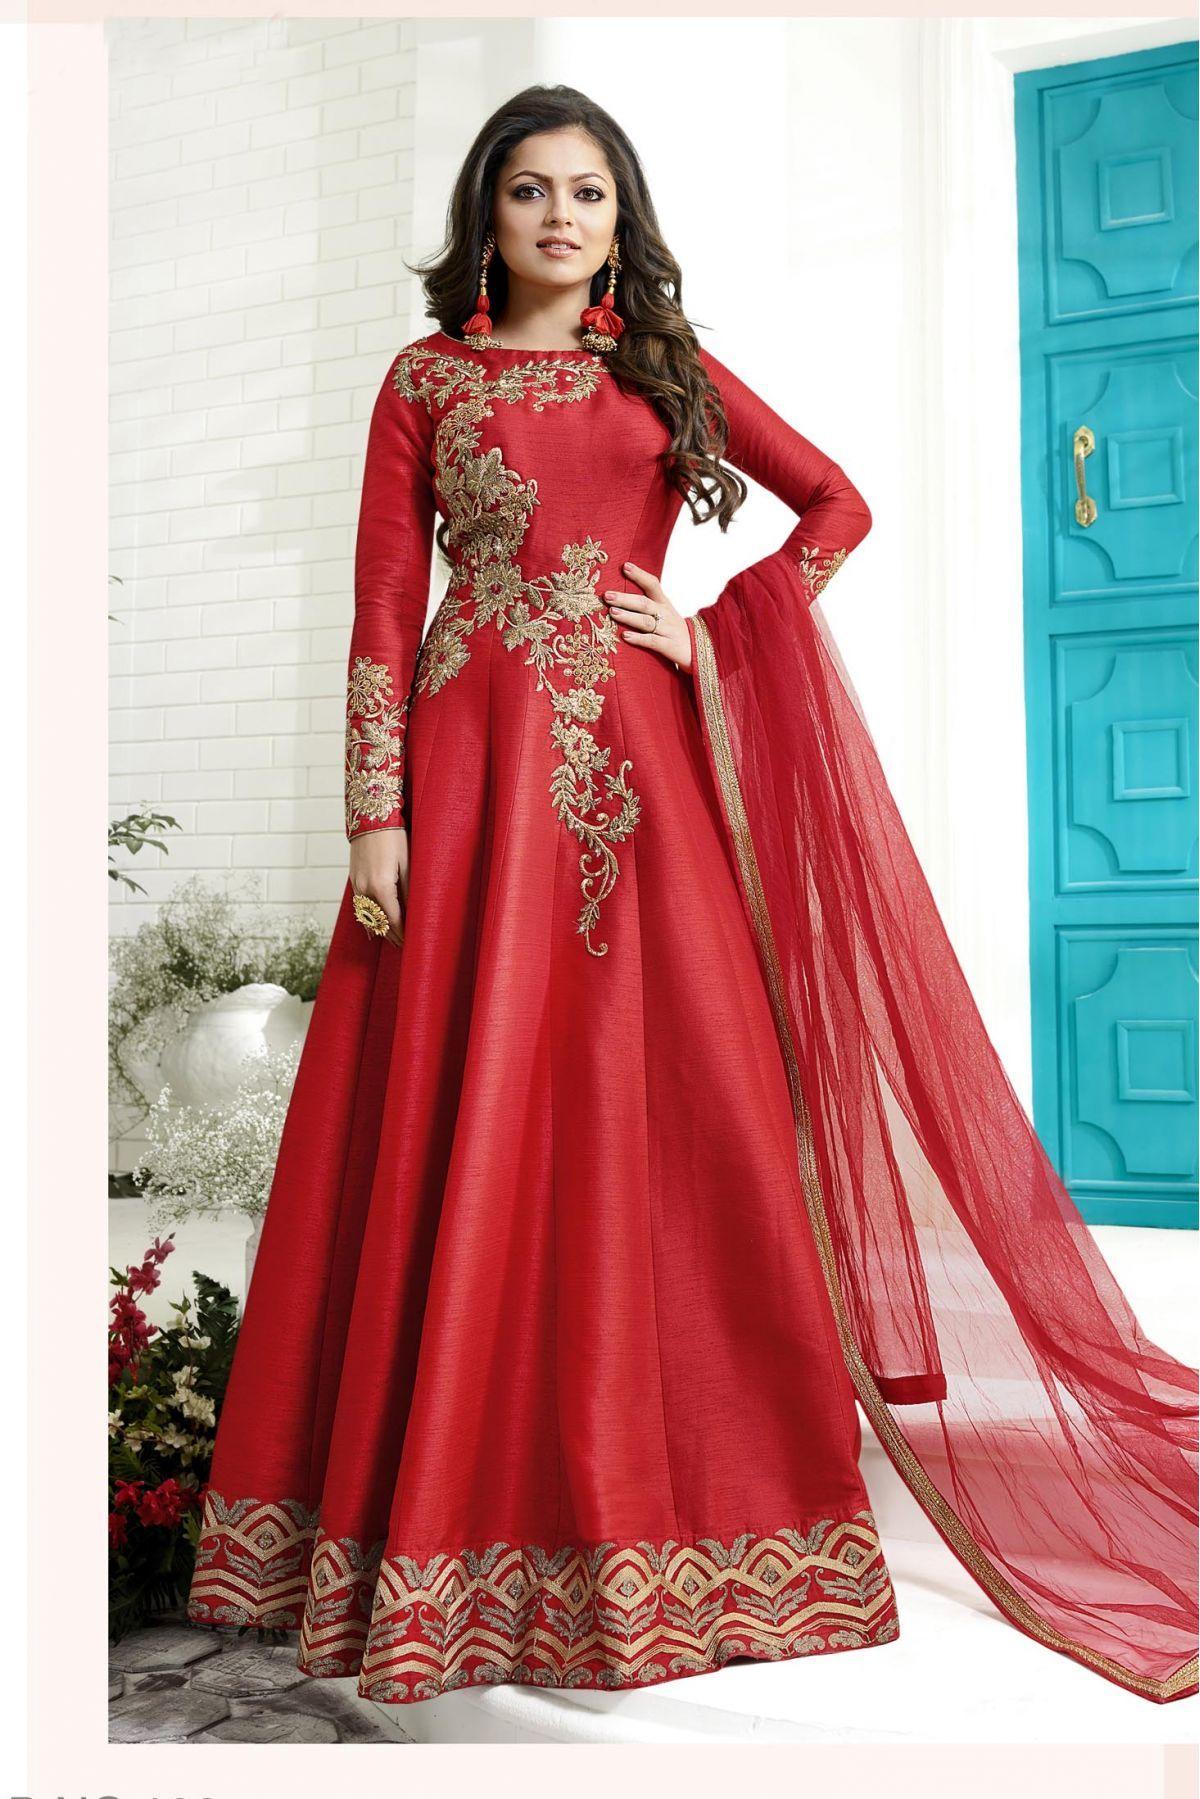 367dc7f652 Buy Art Silk Party Wear Anarkali Suit In Red Colour @ ninecolours.com.  Worldwide